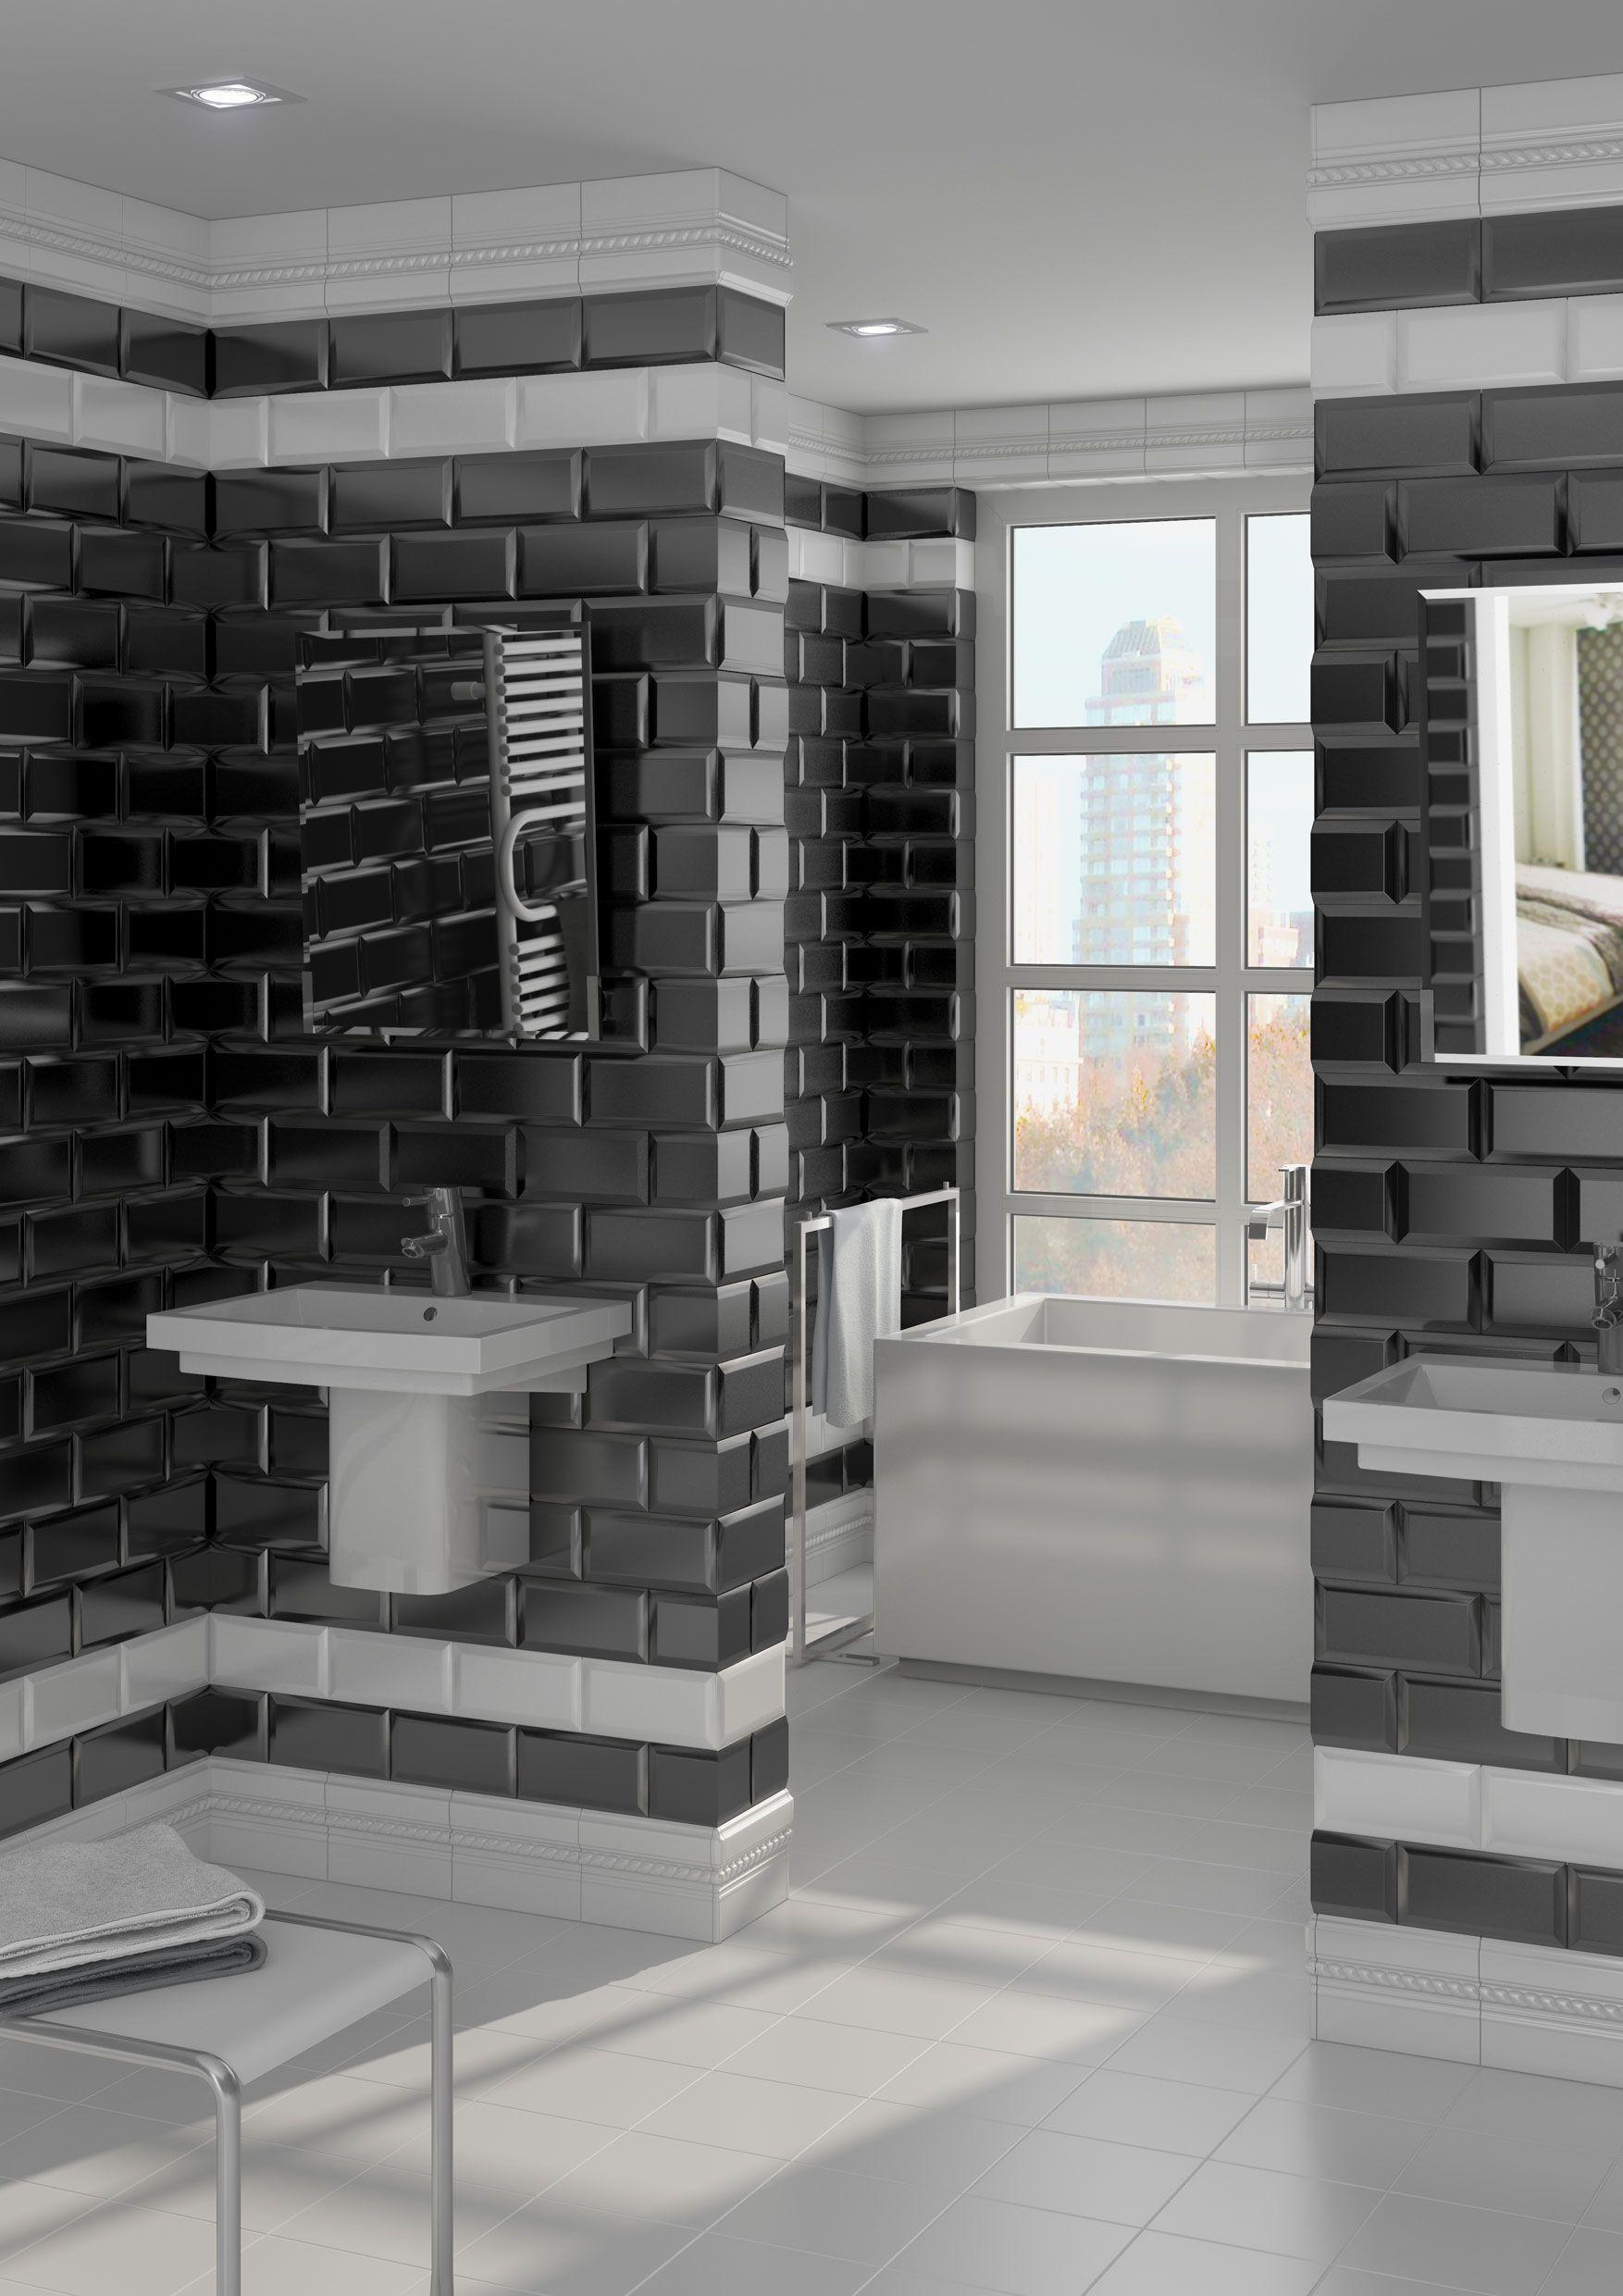 Product Wall Tiles MUGAT Setting Bathroom BATHROOM BAÑO - Slip resistant tiles bathroom for bathroom decor ideas